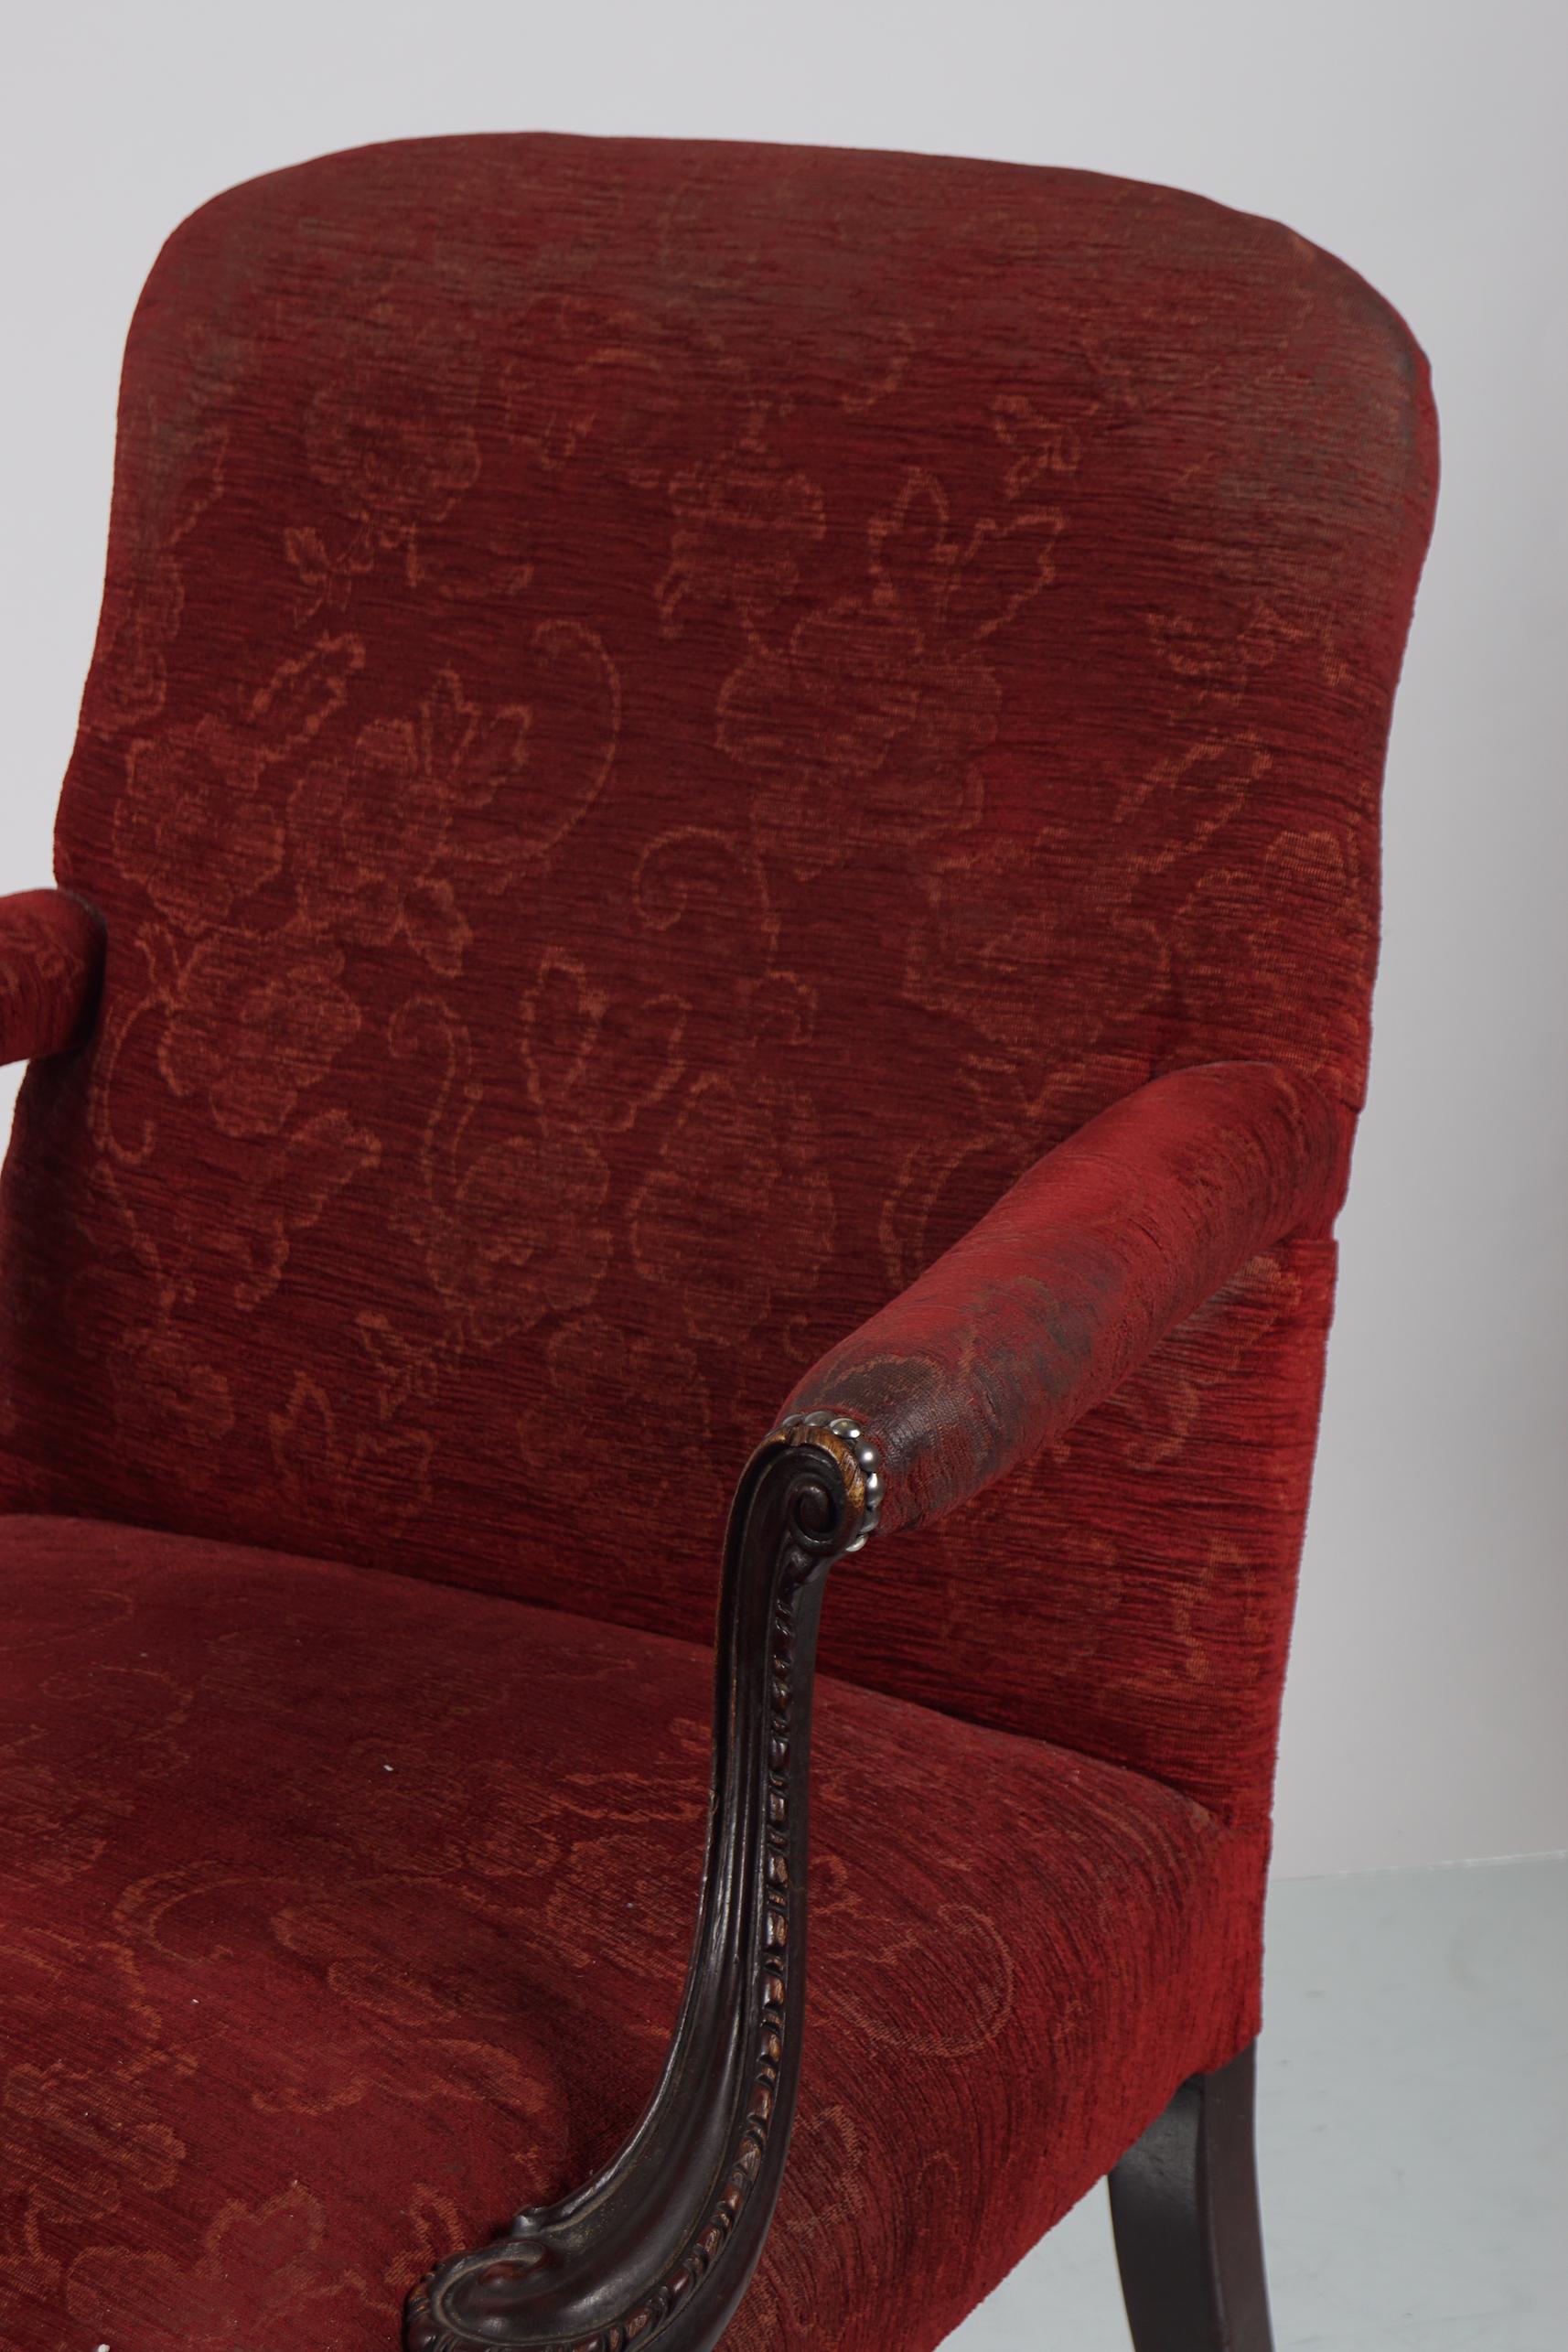 19TH-CENTURY MAHOGANY GAINSBOROUGH CHAIR - Image 2 of 2